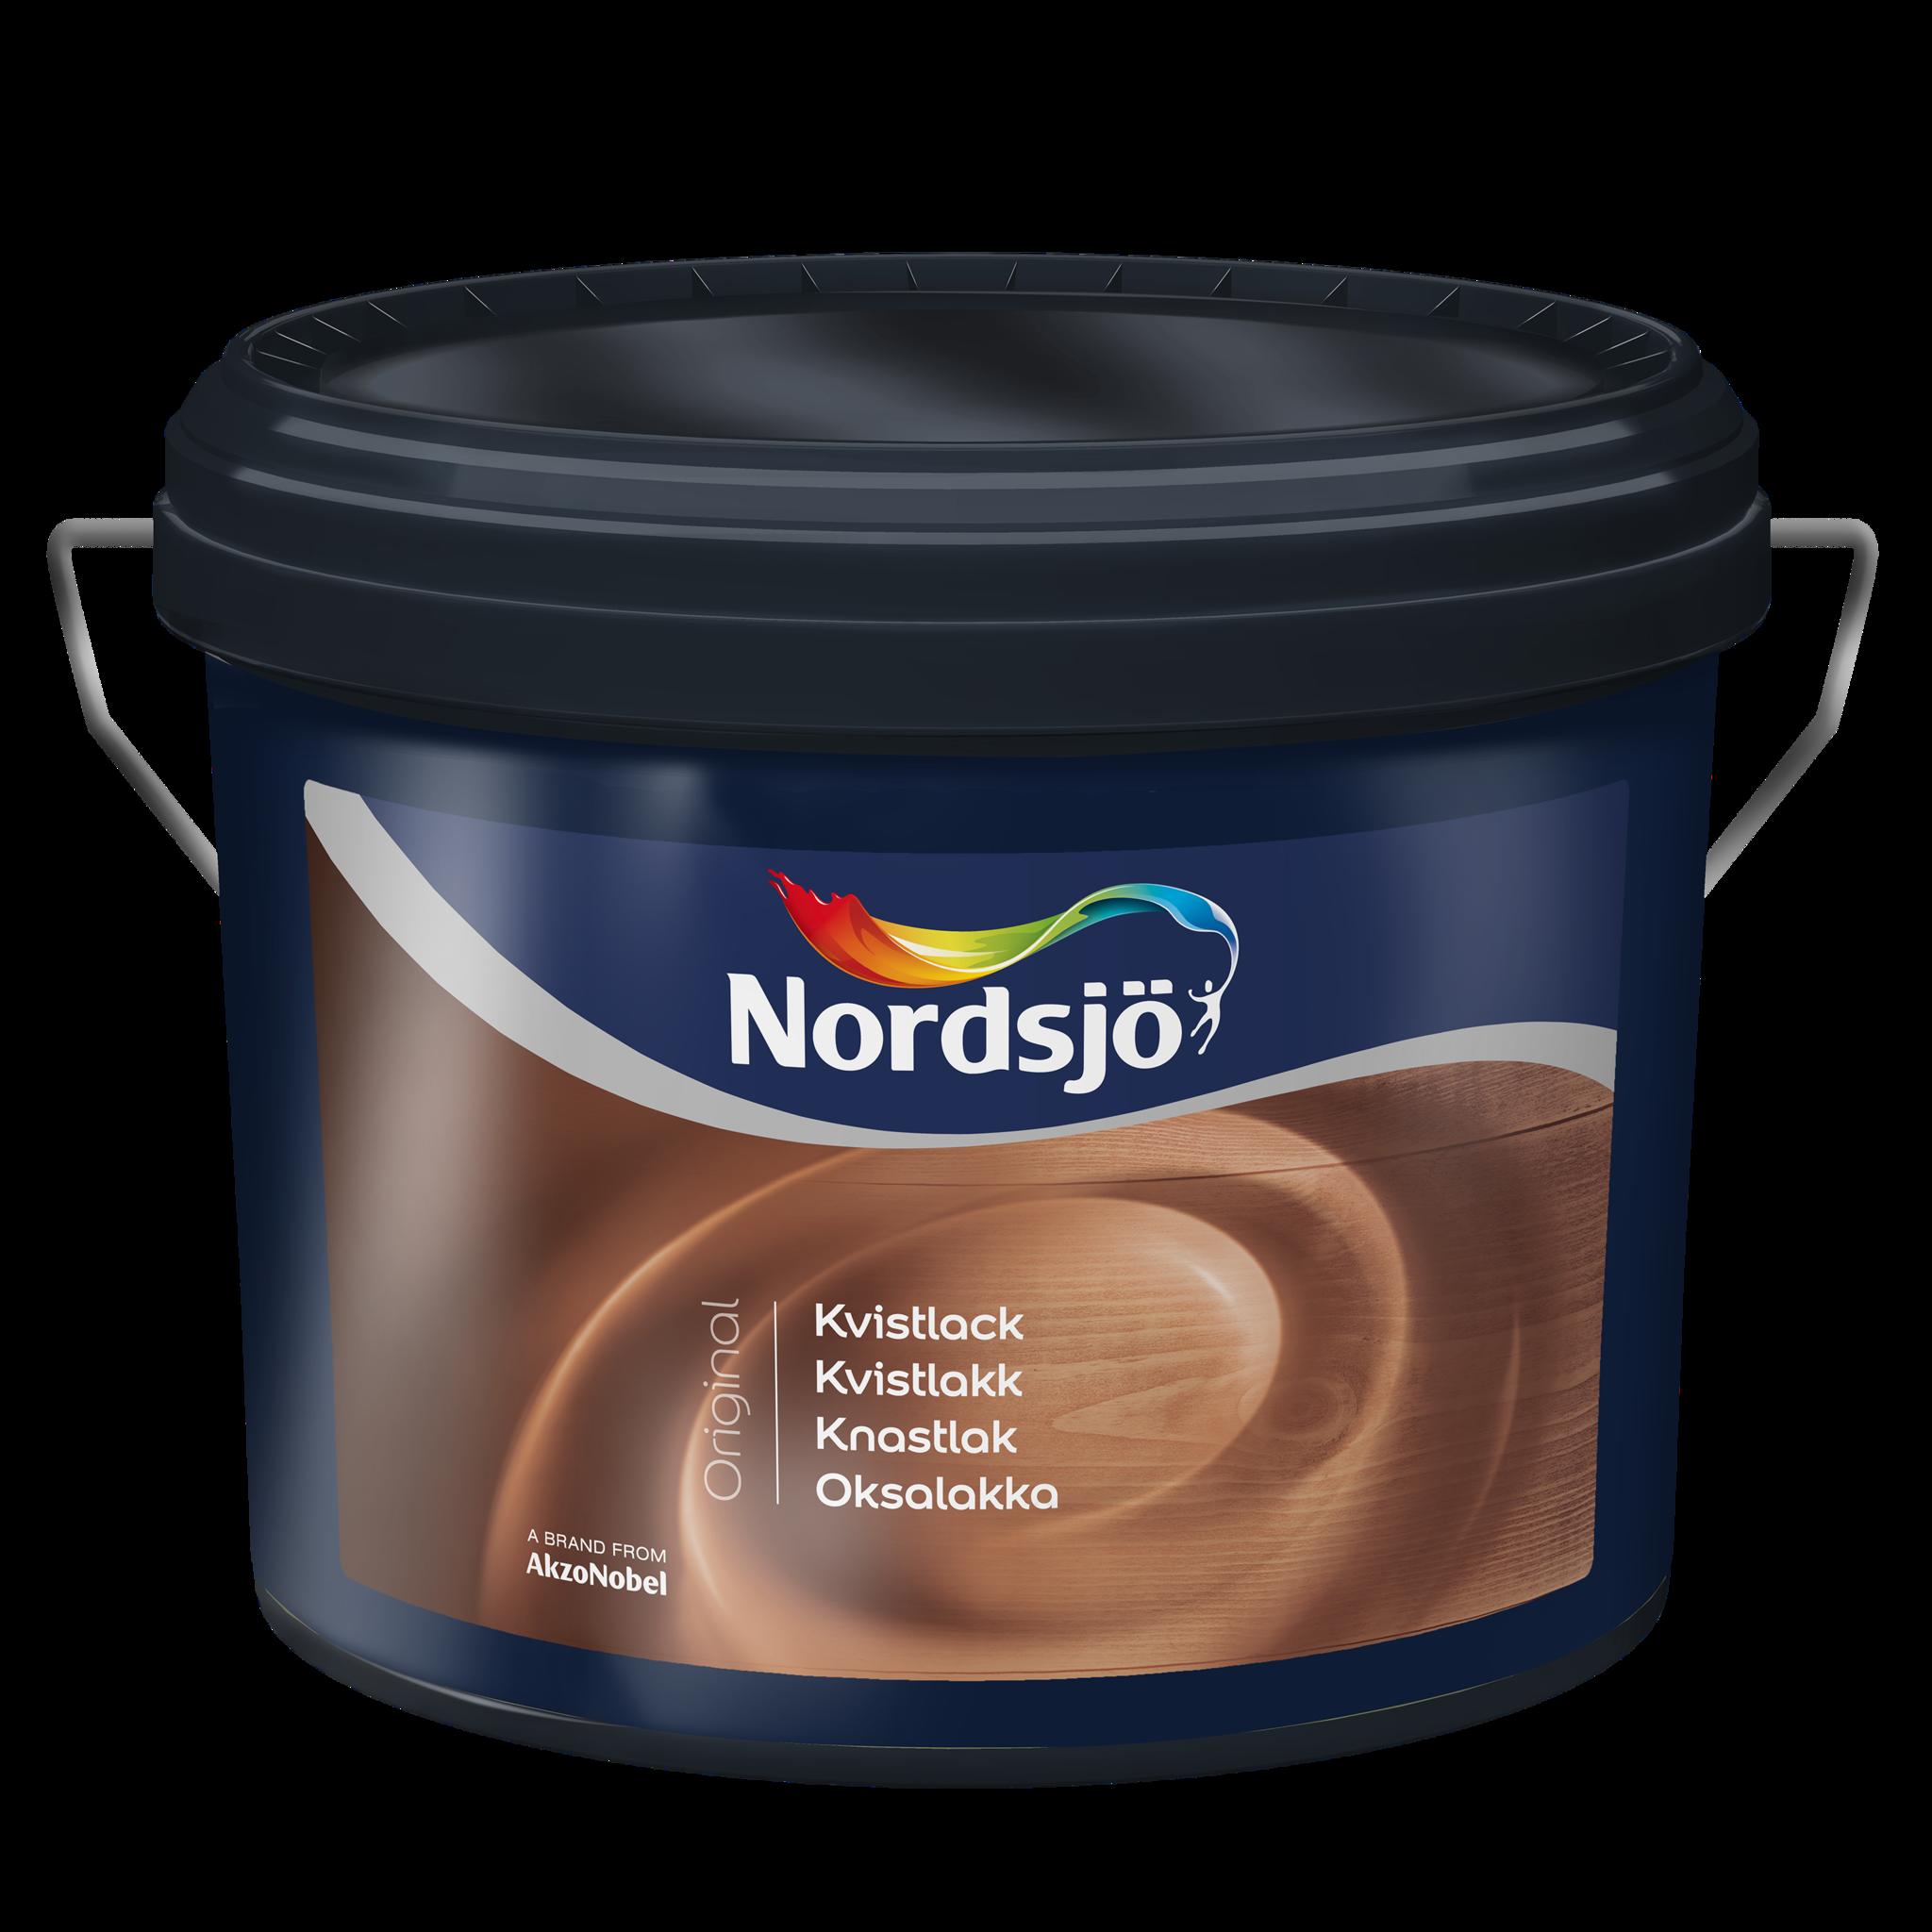 Nordsjö Original Kvistlack